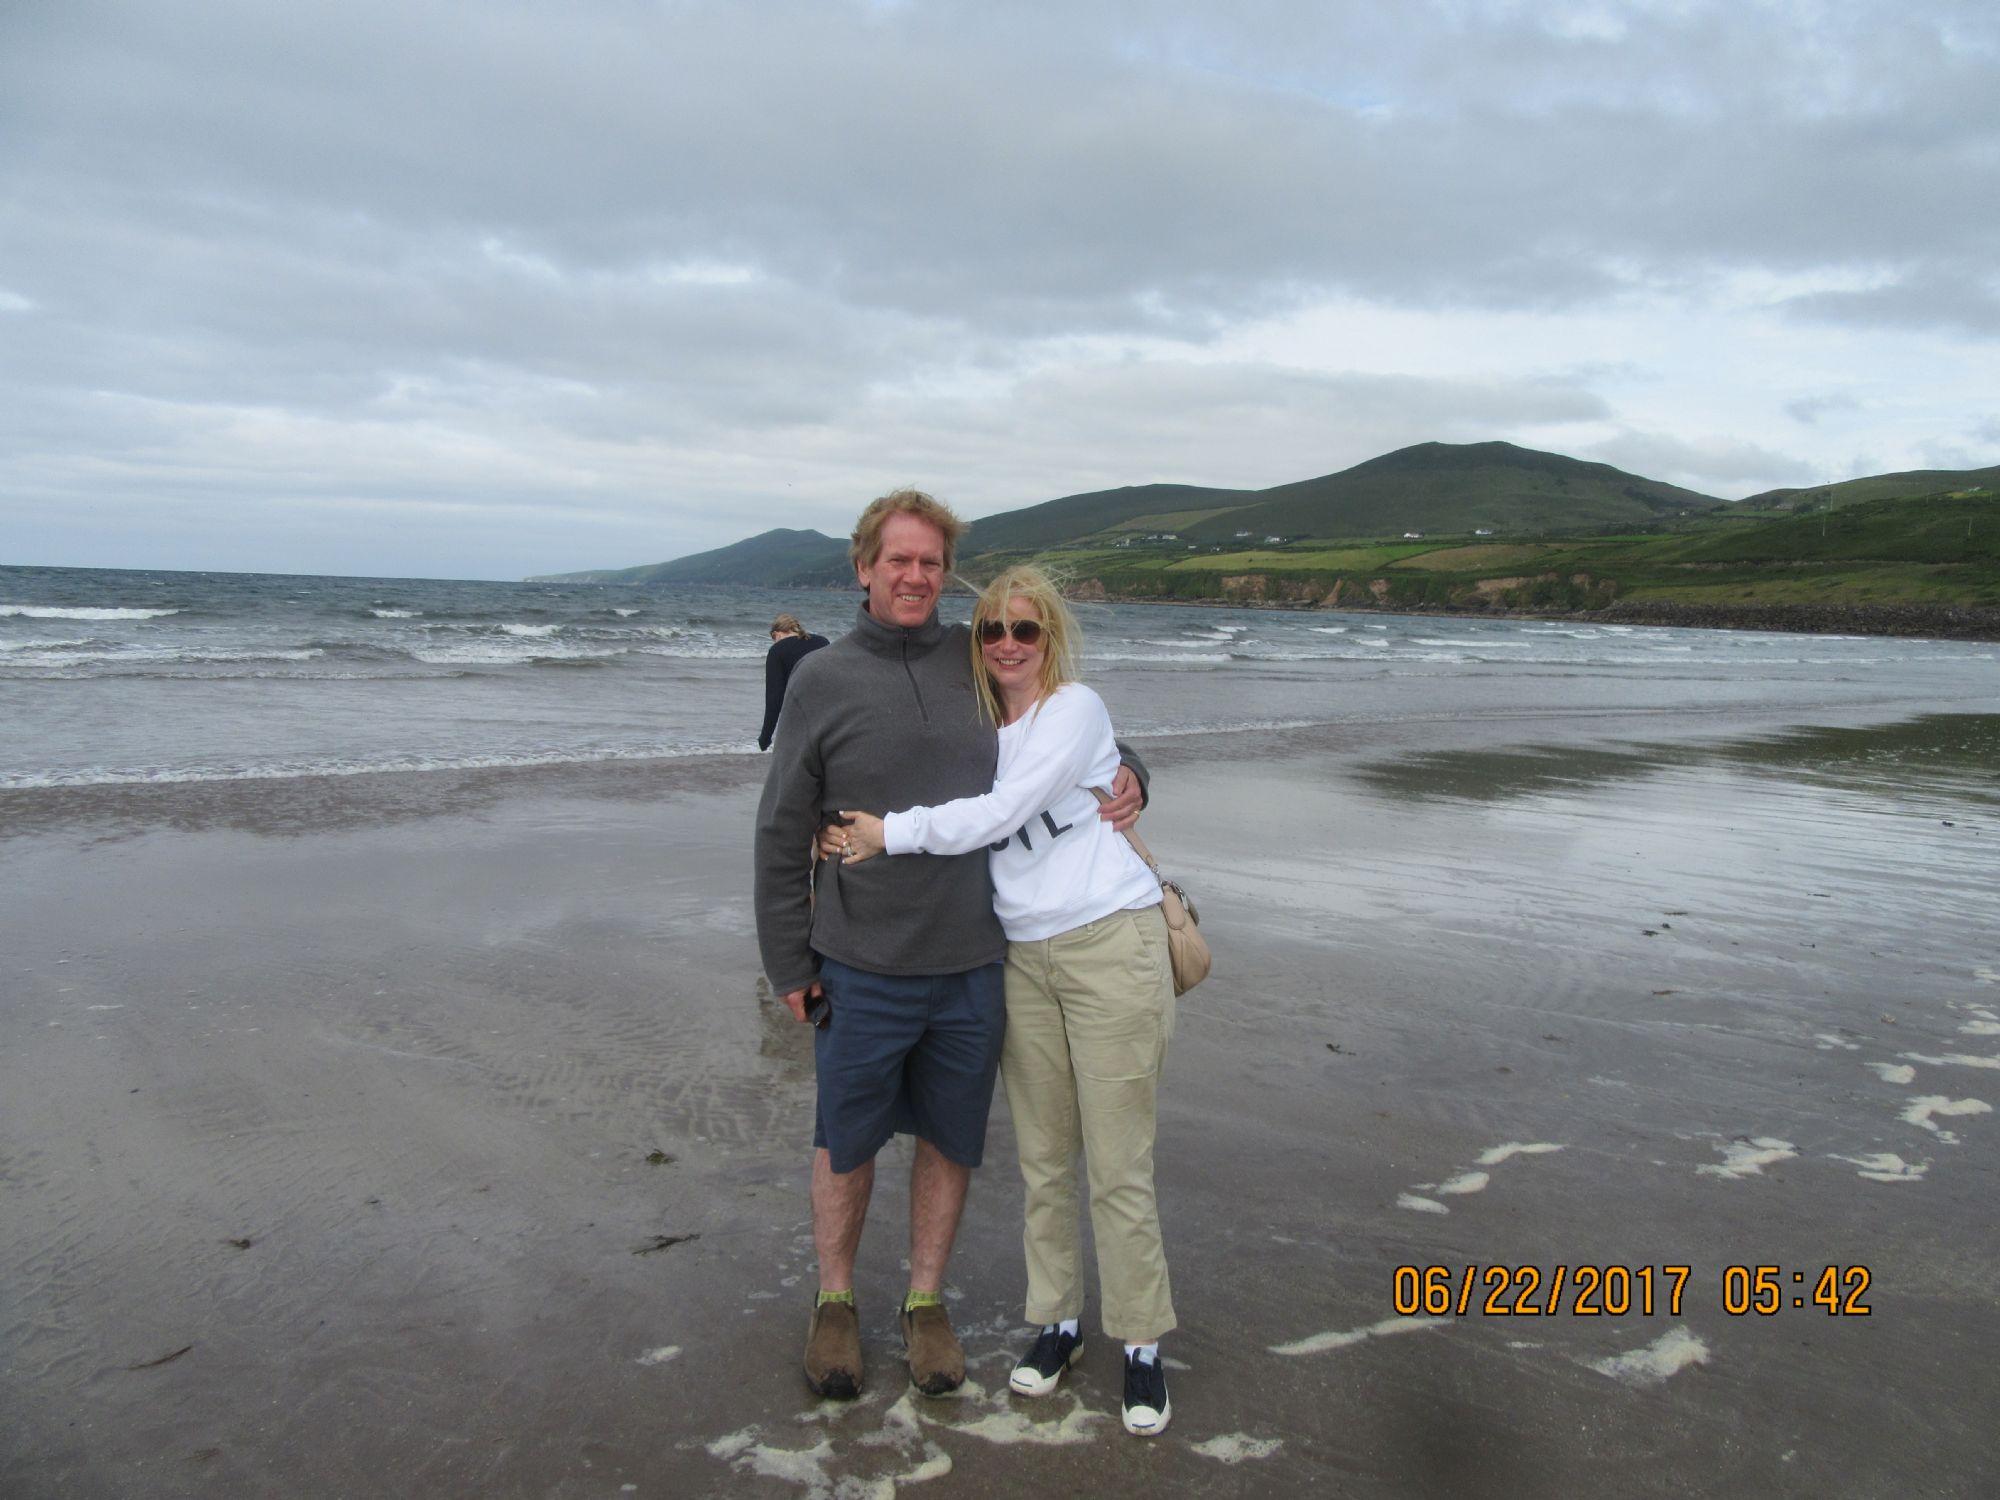 Us on beach, Dingle Peninsula